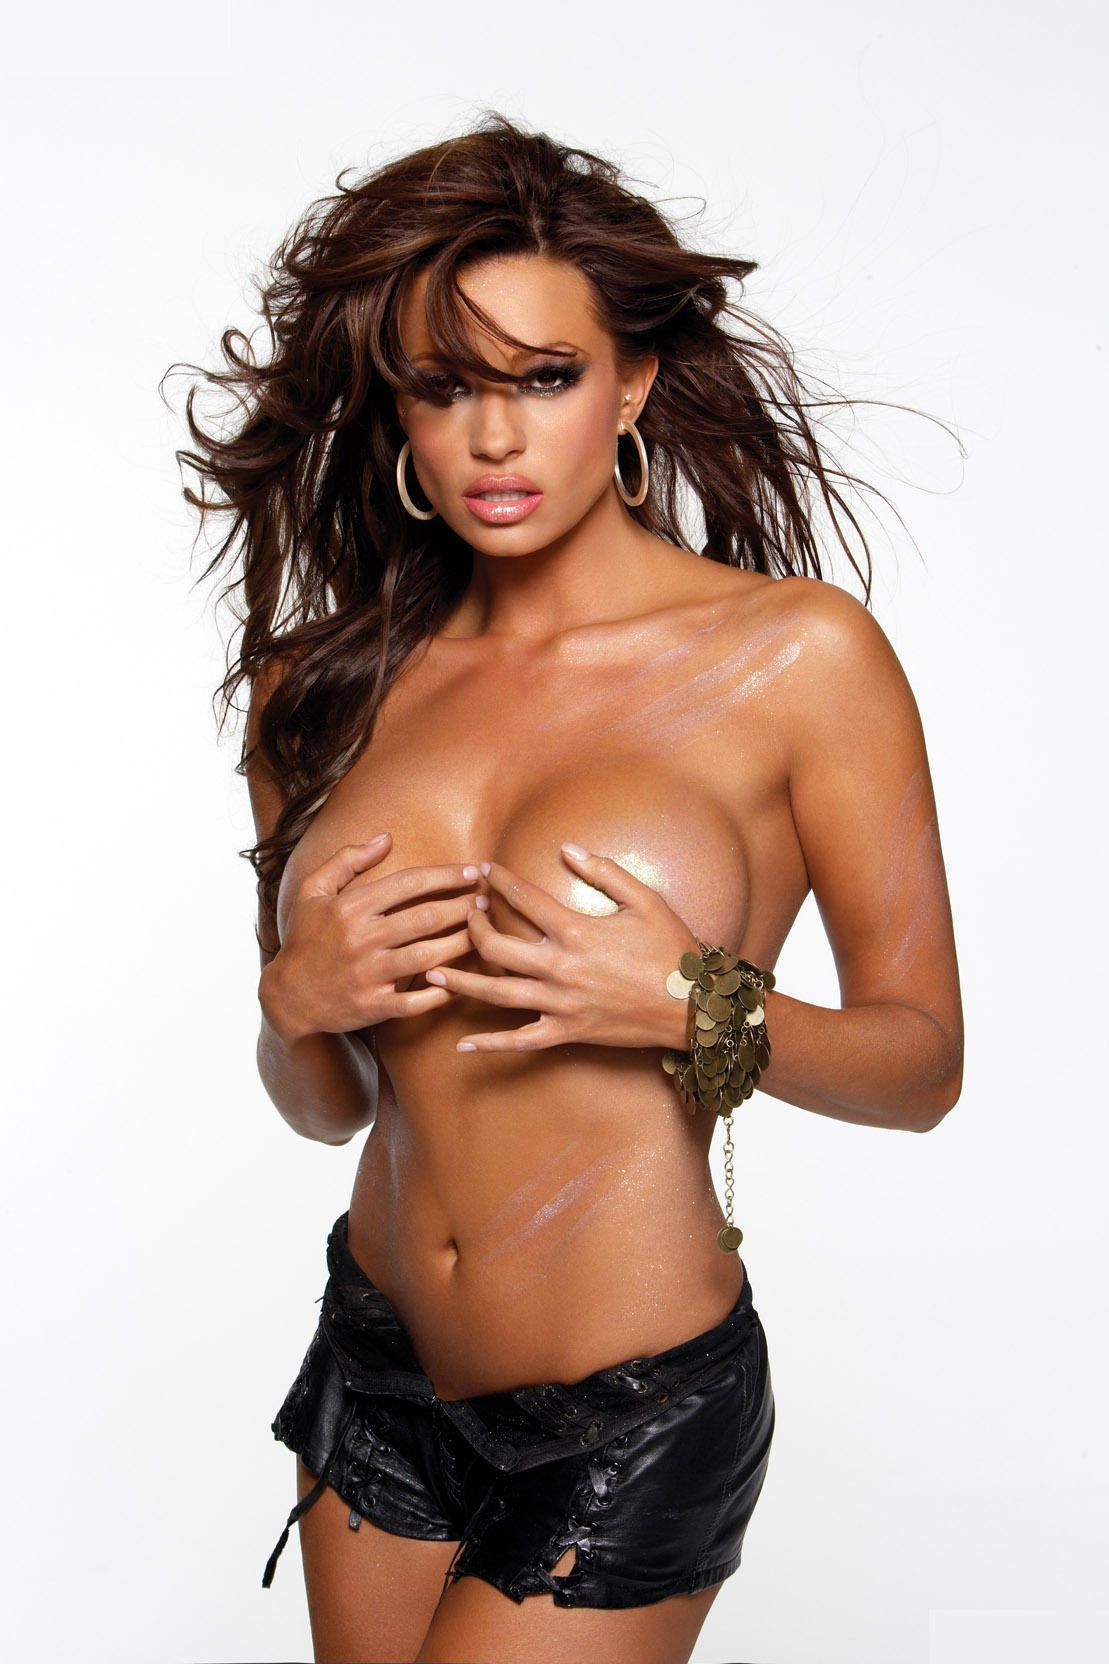 Wwe Candice Michelle Porn Great pinsherman robertson on divas | pinterest